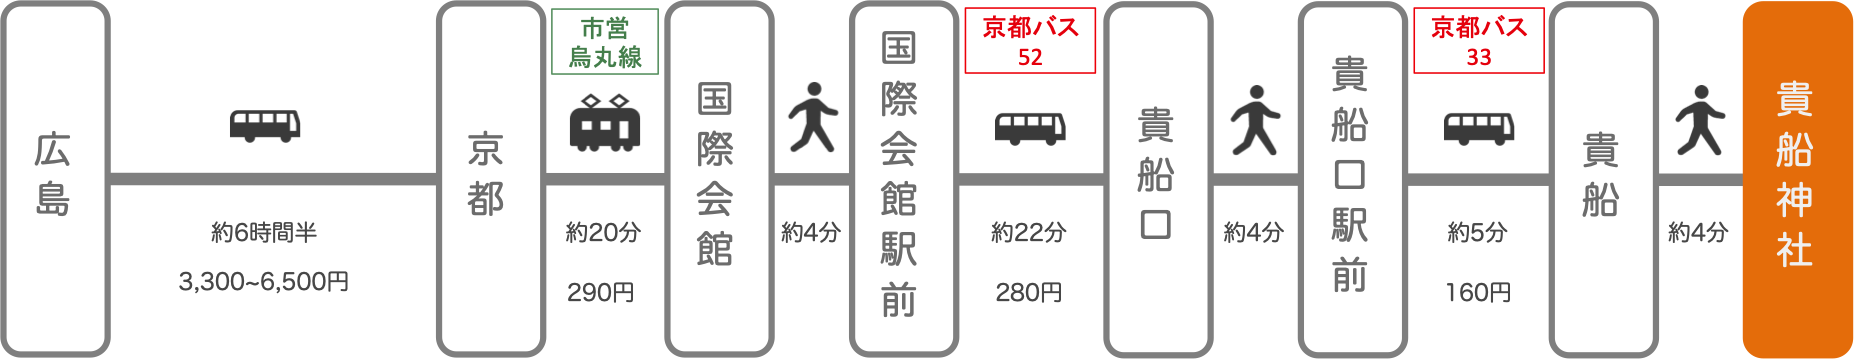 貴船神社_広島_高速バス